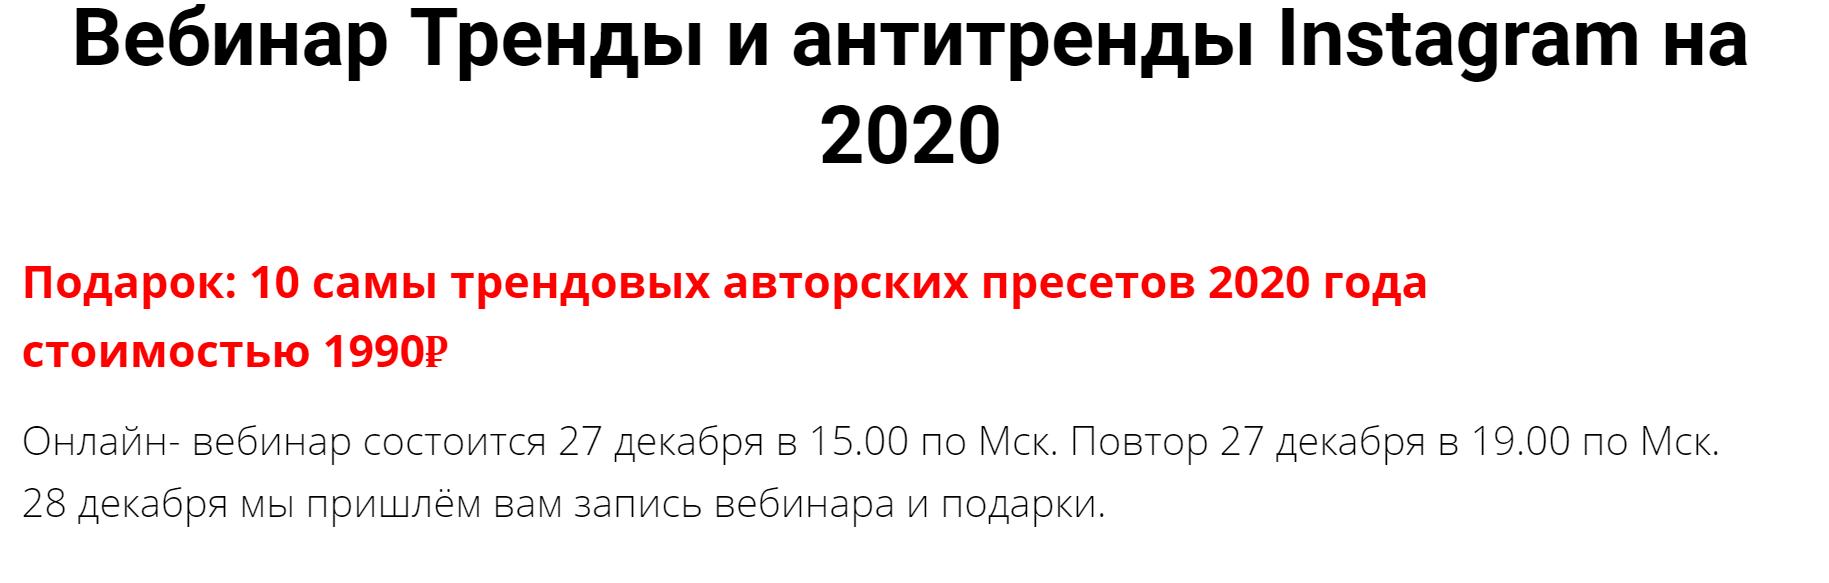 2020-01-14_11-38-43